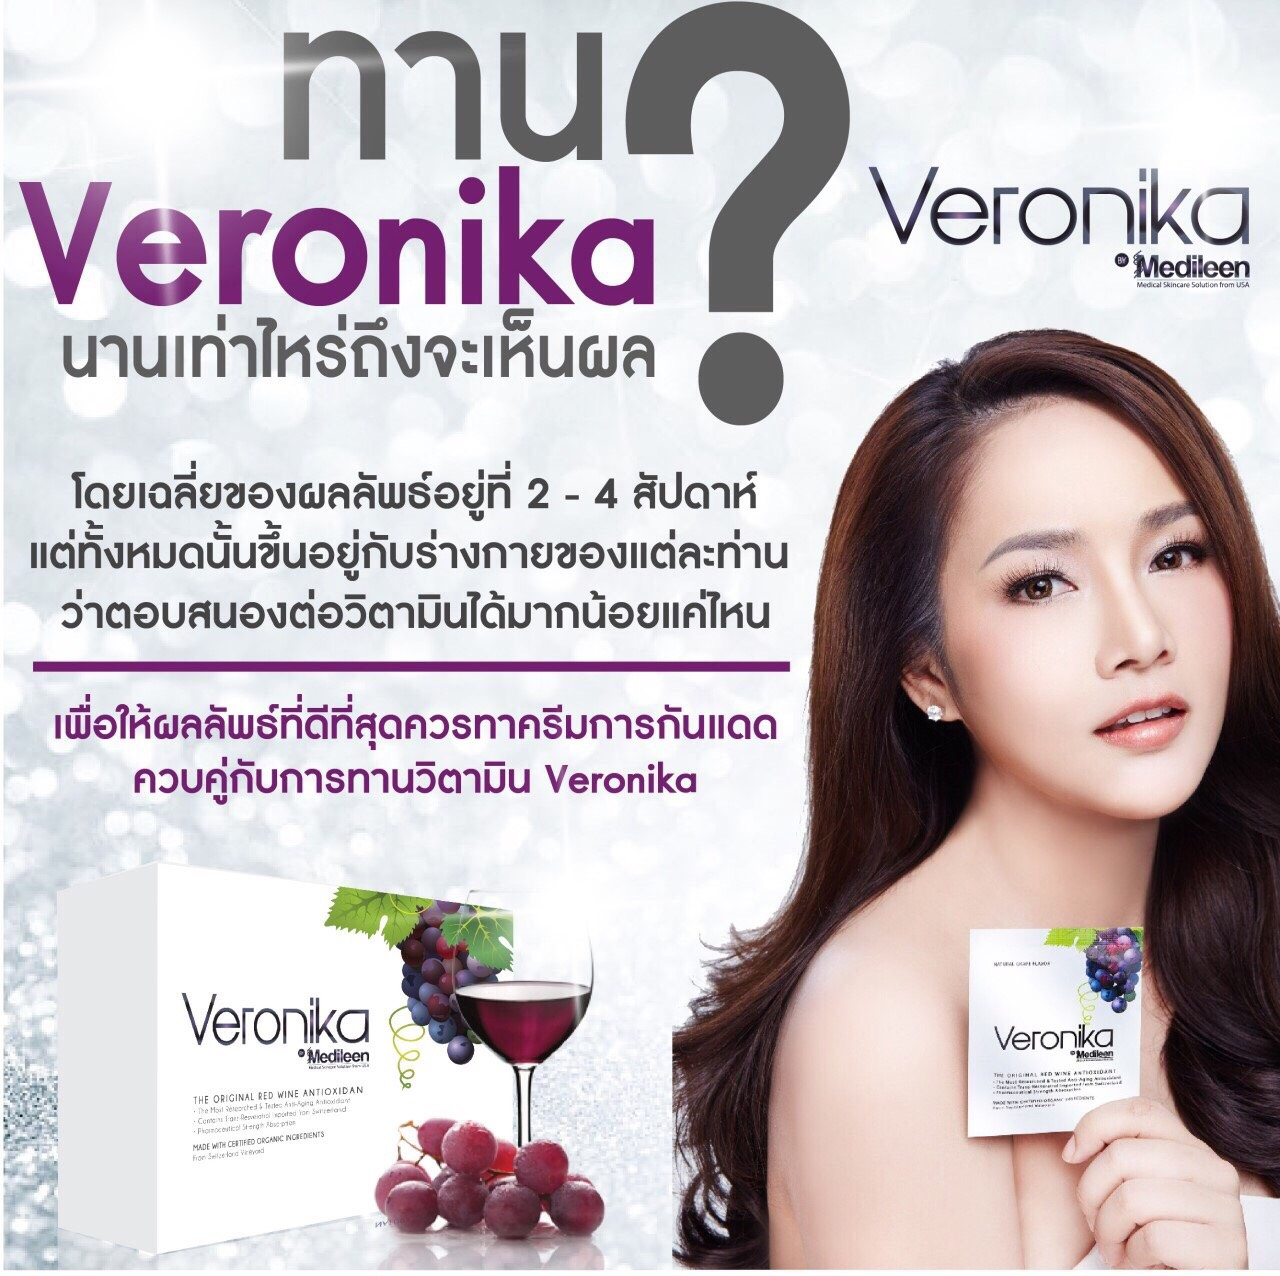 Veronika by Medileen 30 ซอง ปรับผิวขาว ชะลอความแก่ ปลอดภัยแบบ Organic ของแท้ ราคาถูก ปลีก/ส่ง โทร 089-778-7338,088-222-4622 เอจ